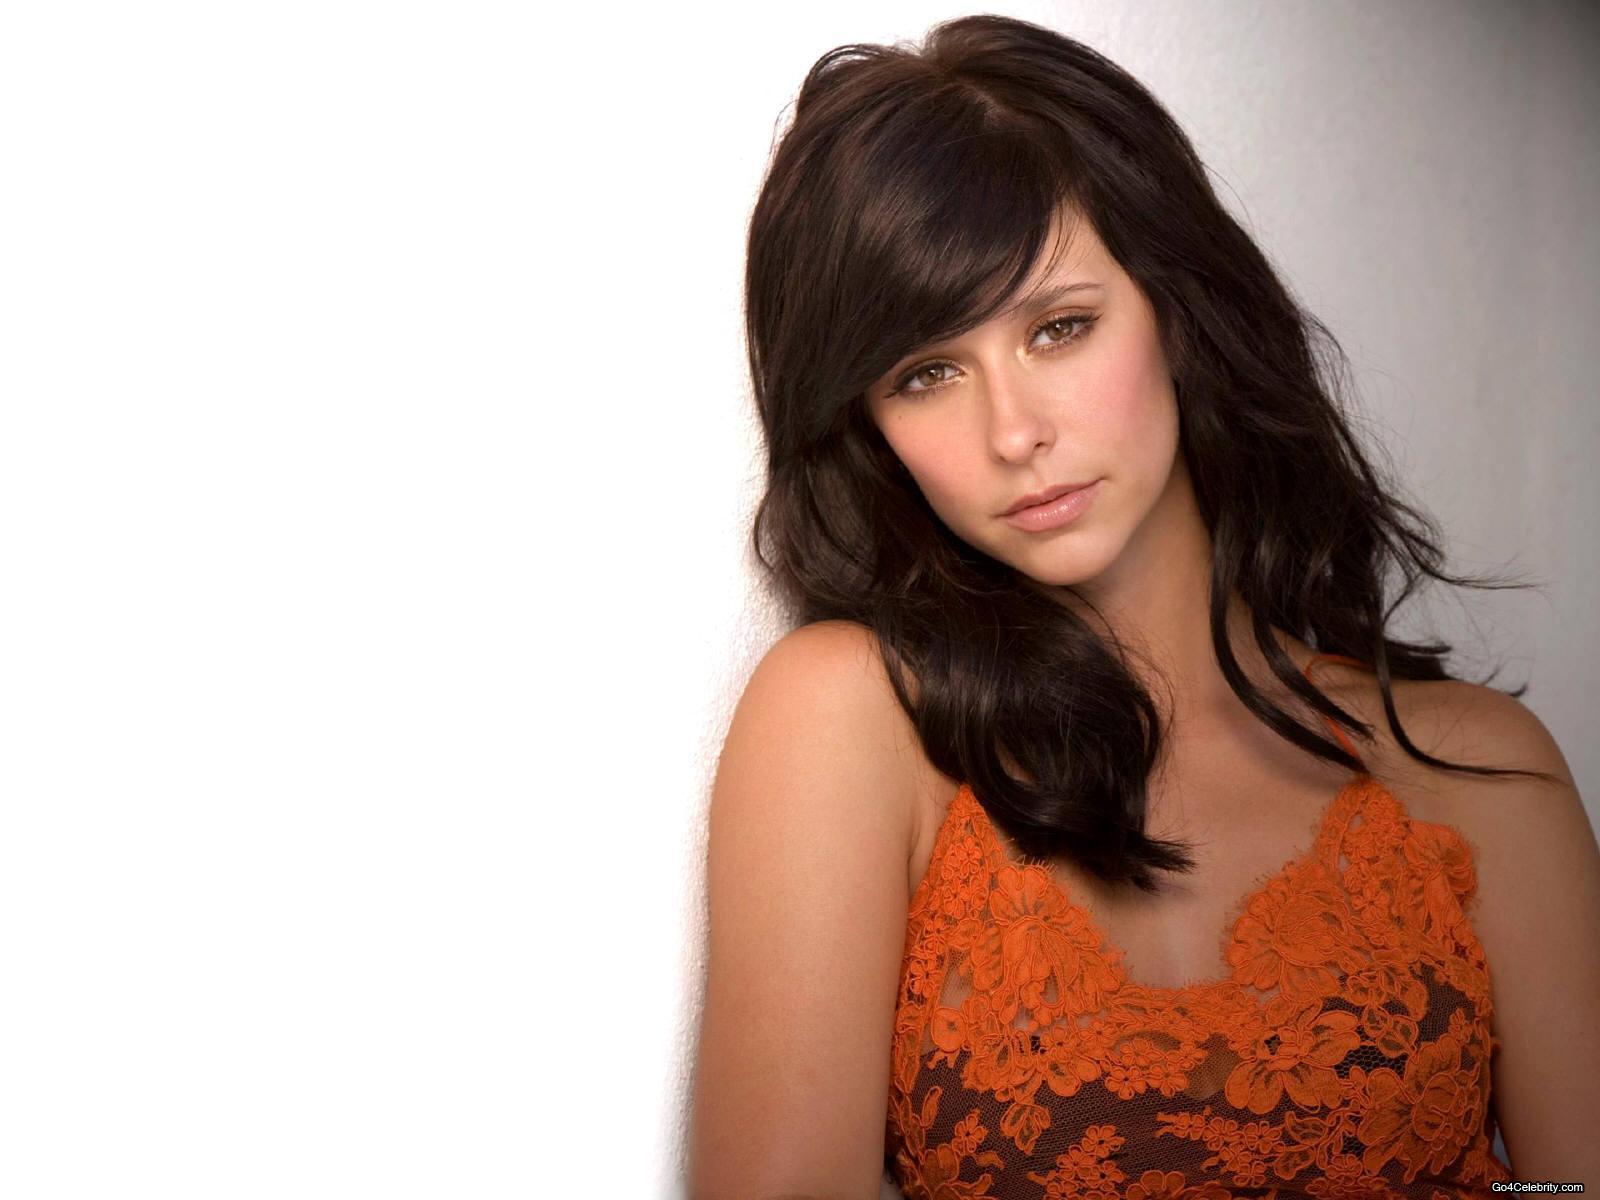 Jennifer Love Hewitt Photo 1054 Of 1465 Pics Wallpaper Photo 406549 Theplace2